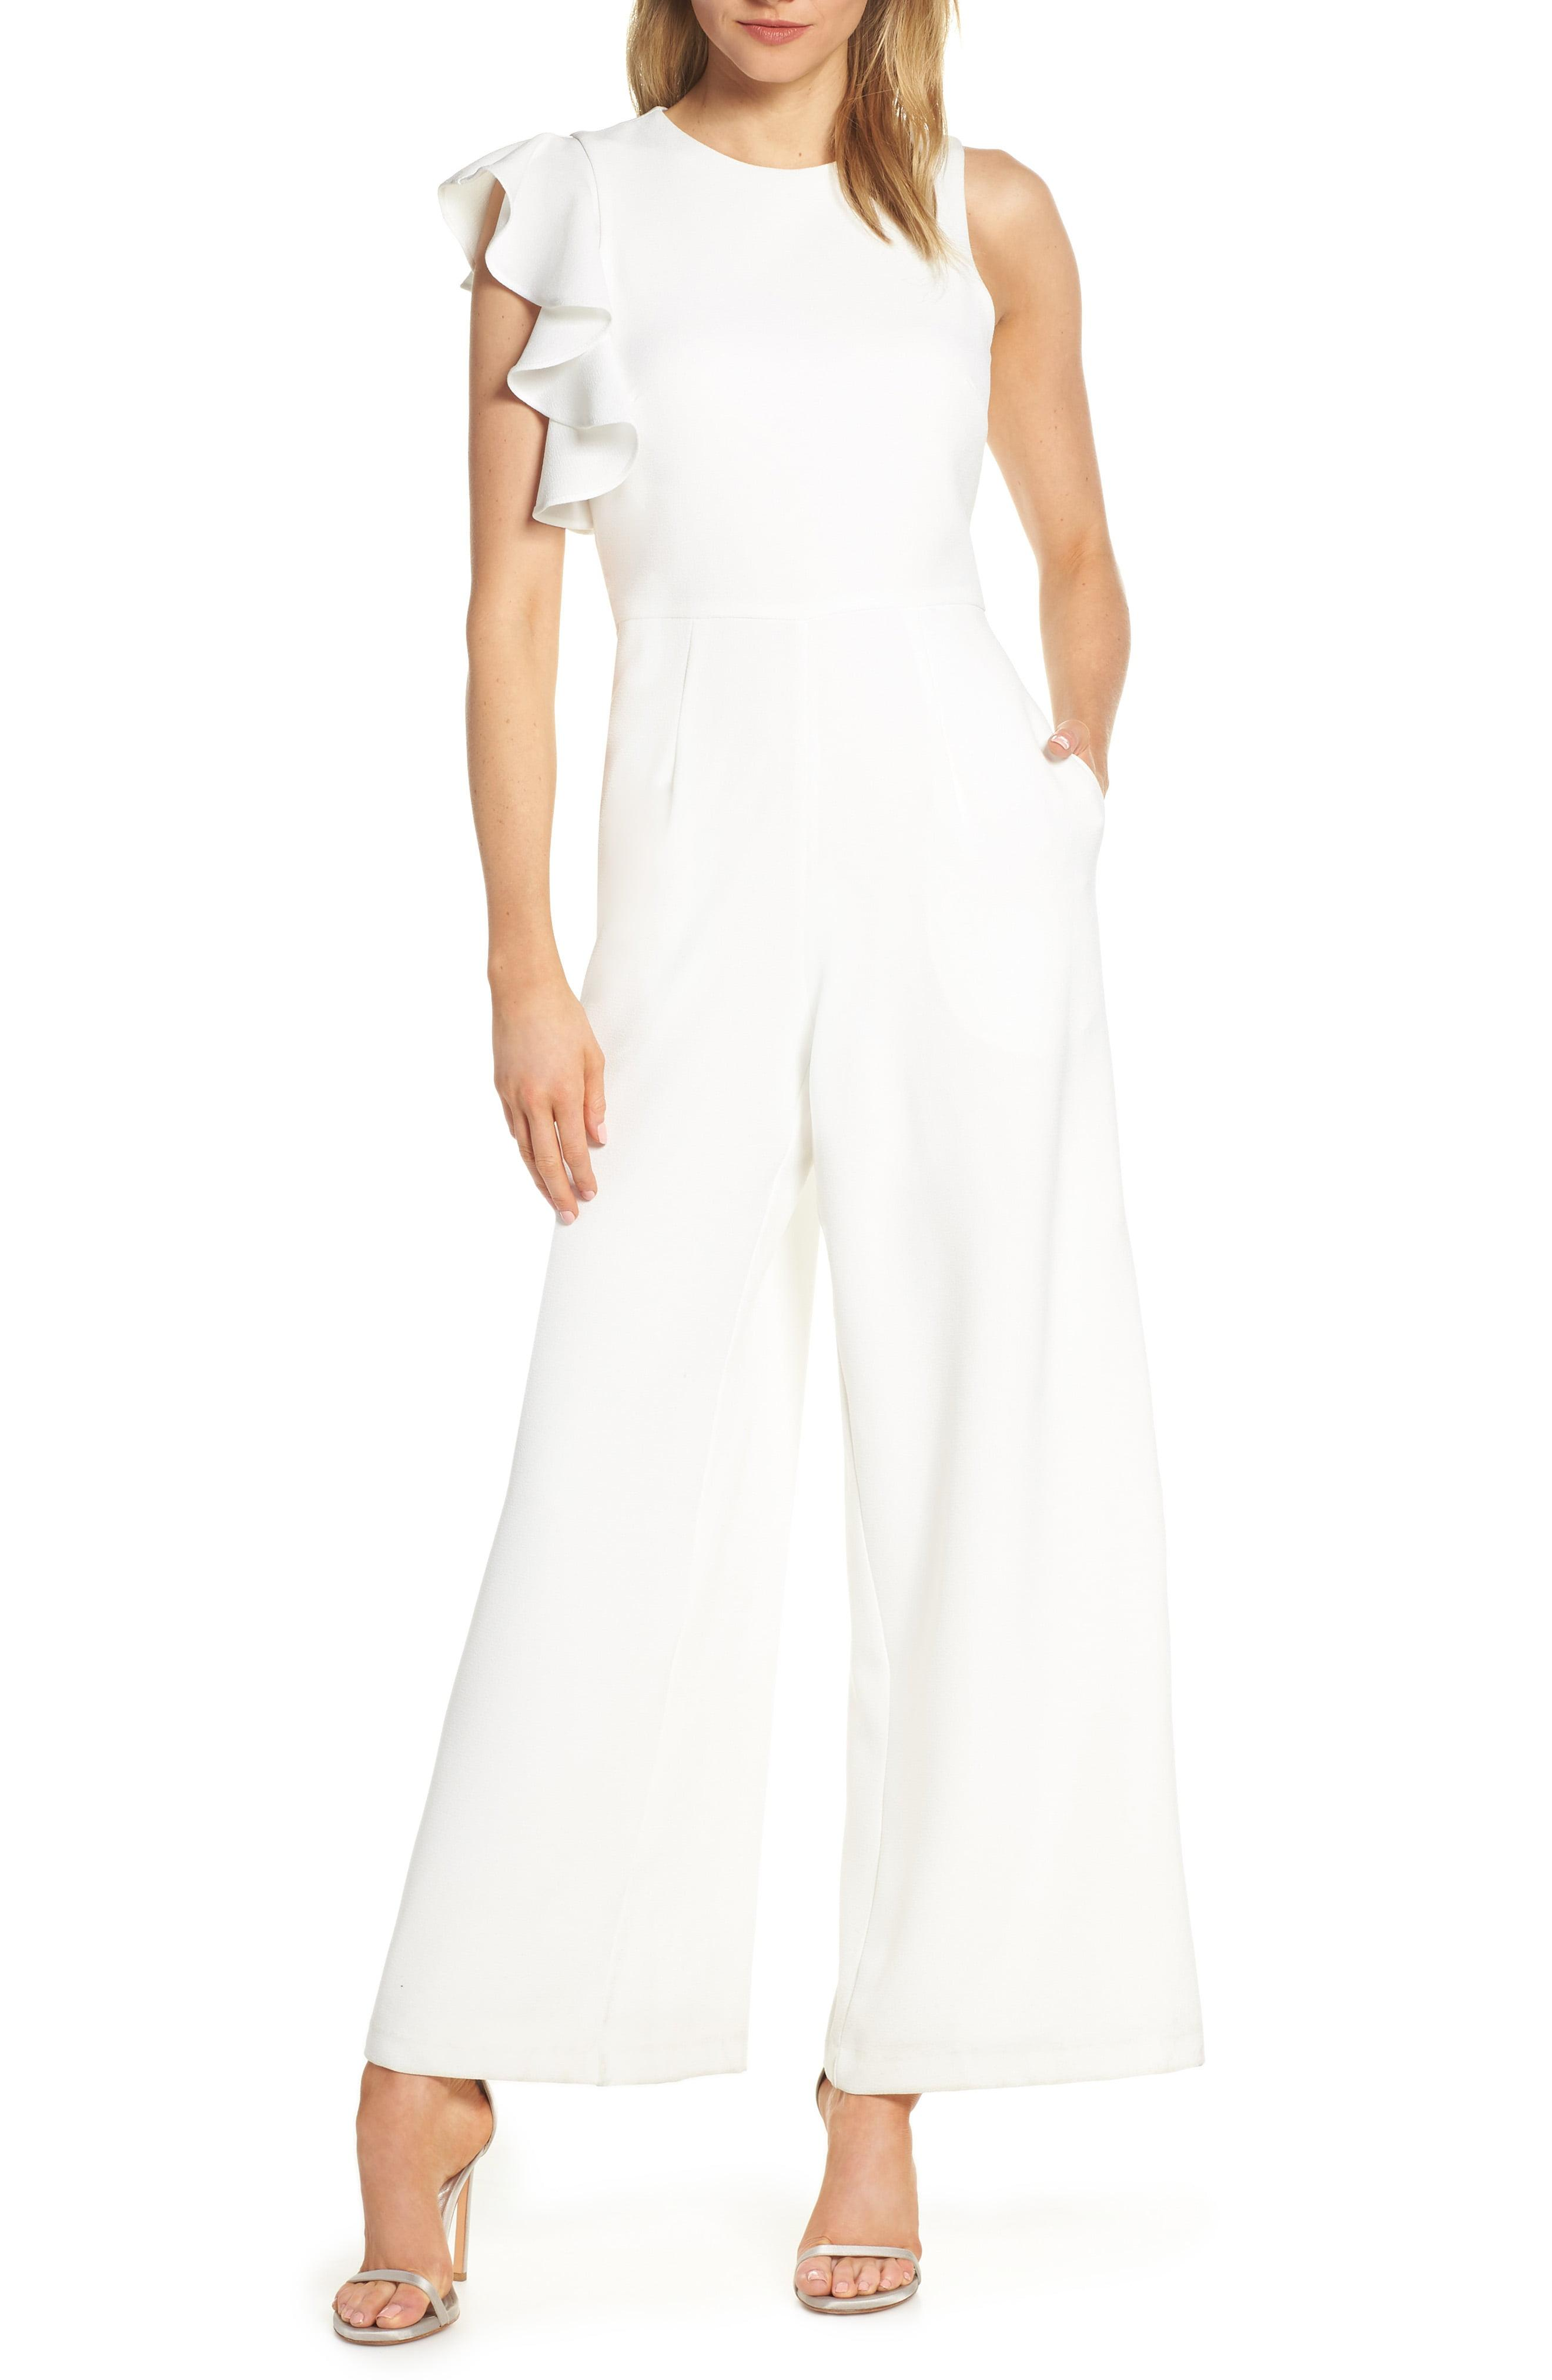 9c12b5d0dbf392 Lyst - Julia Jordan Hunter Crepe Ruffle Shoulder Jumpsuit in White